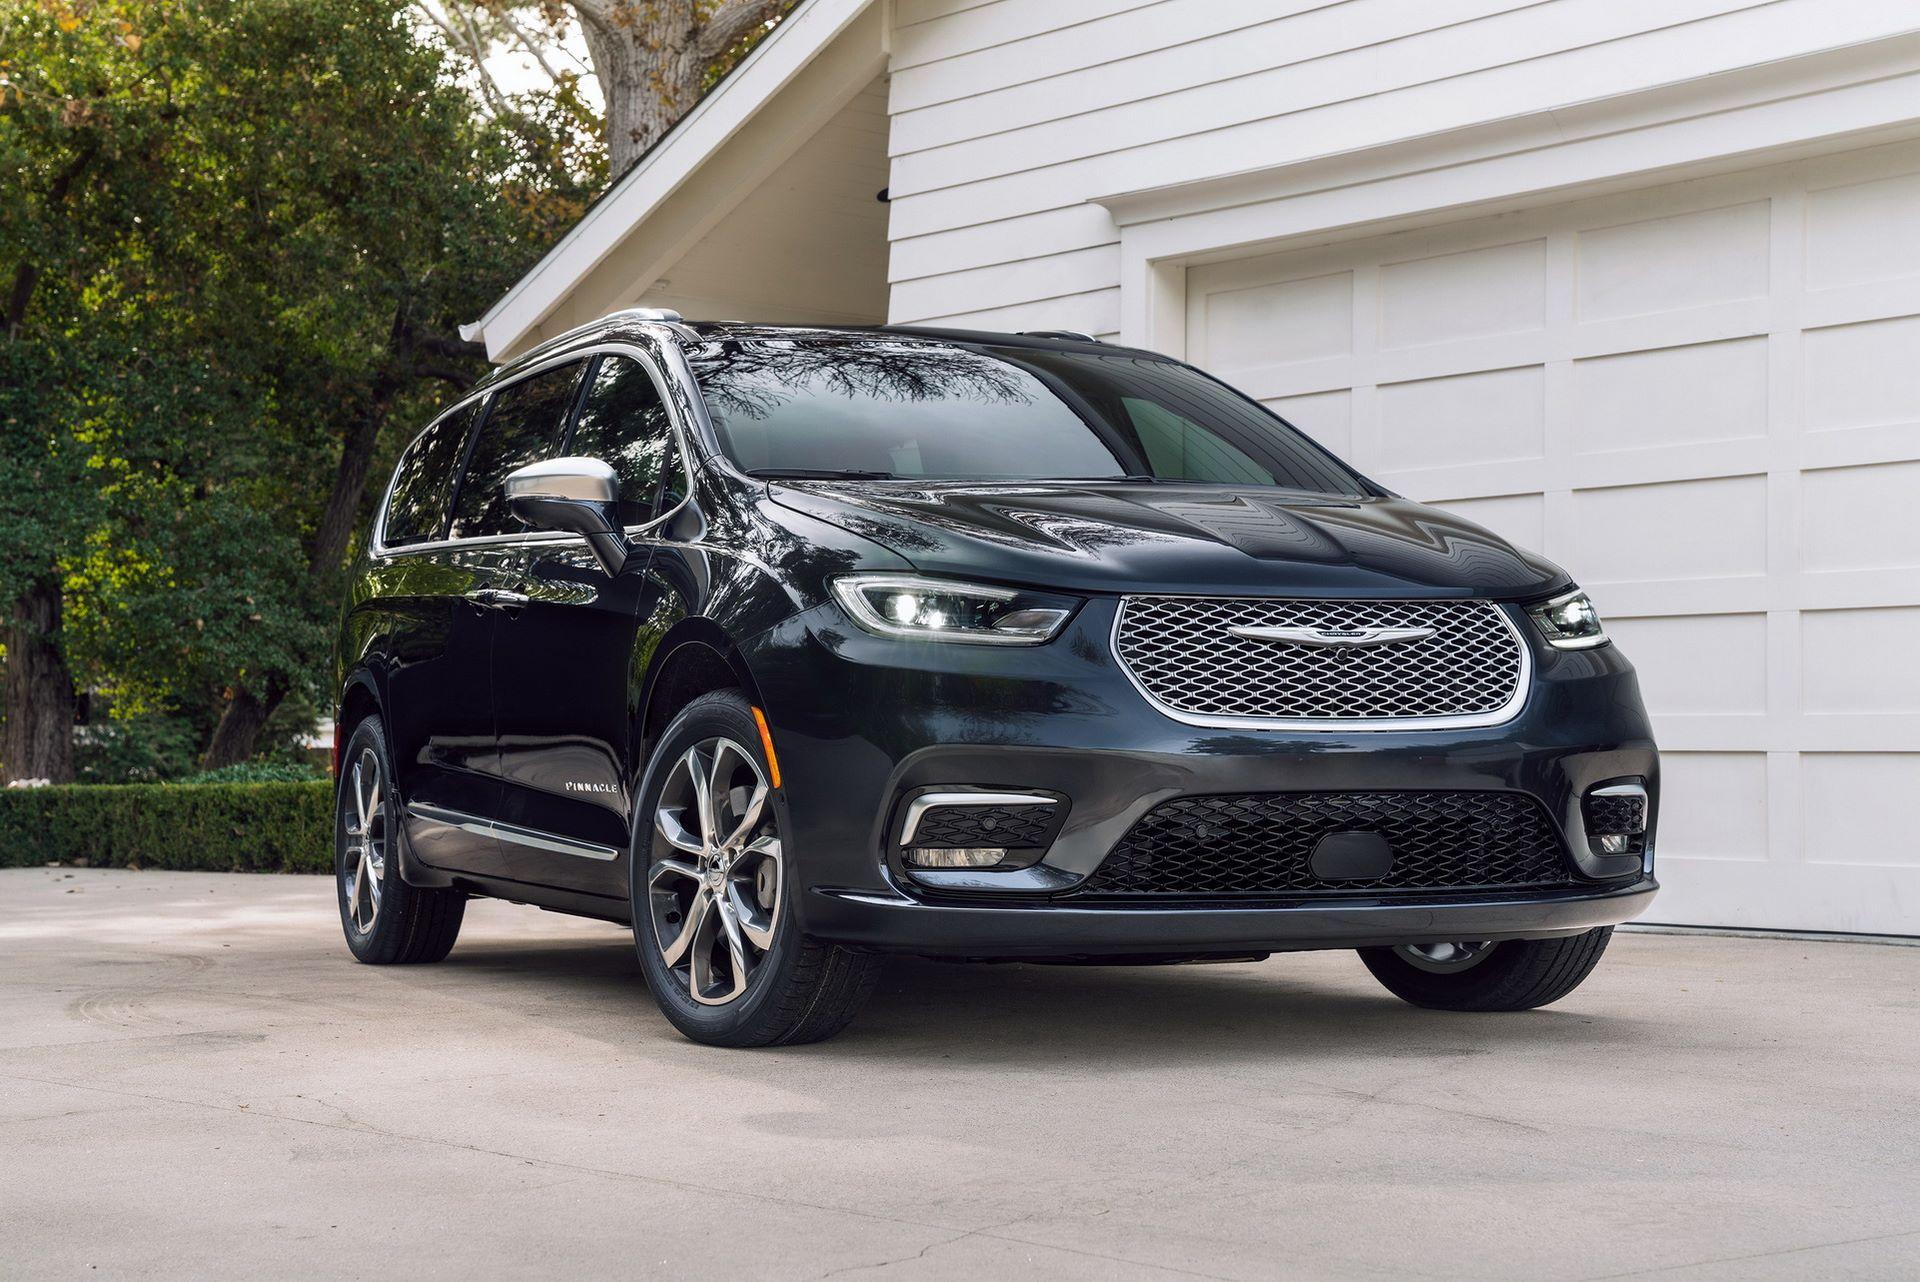 2021-Chrysler-Pacifica-10